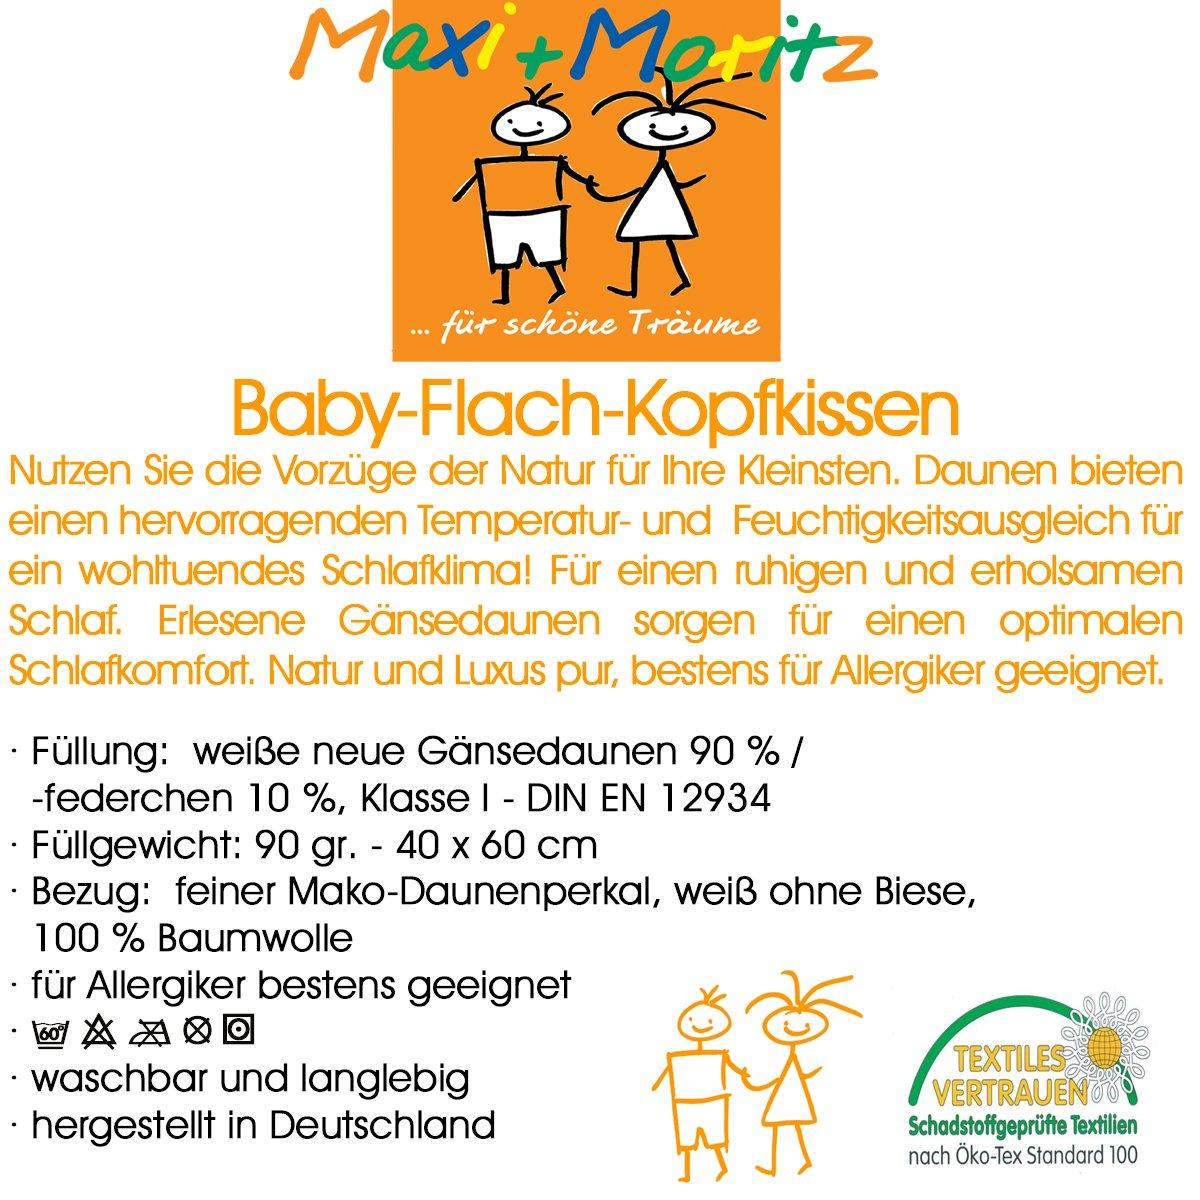 40 x 60 cm Maxi und Moritz Oreiller plat pour b/éb/é